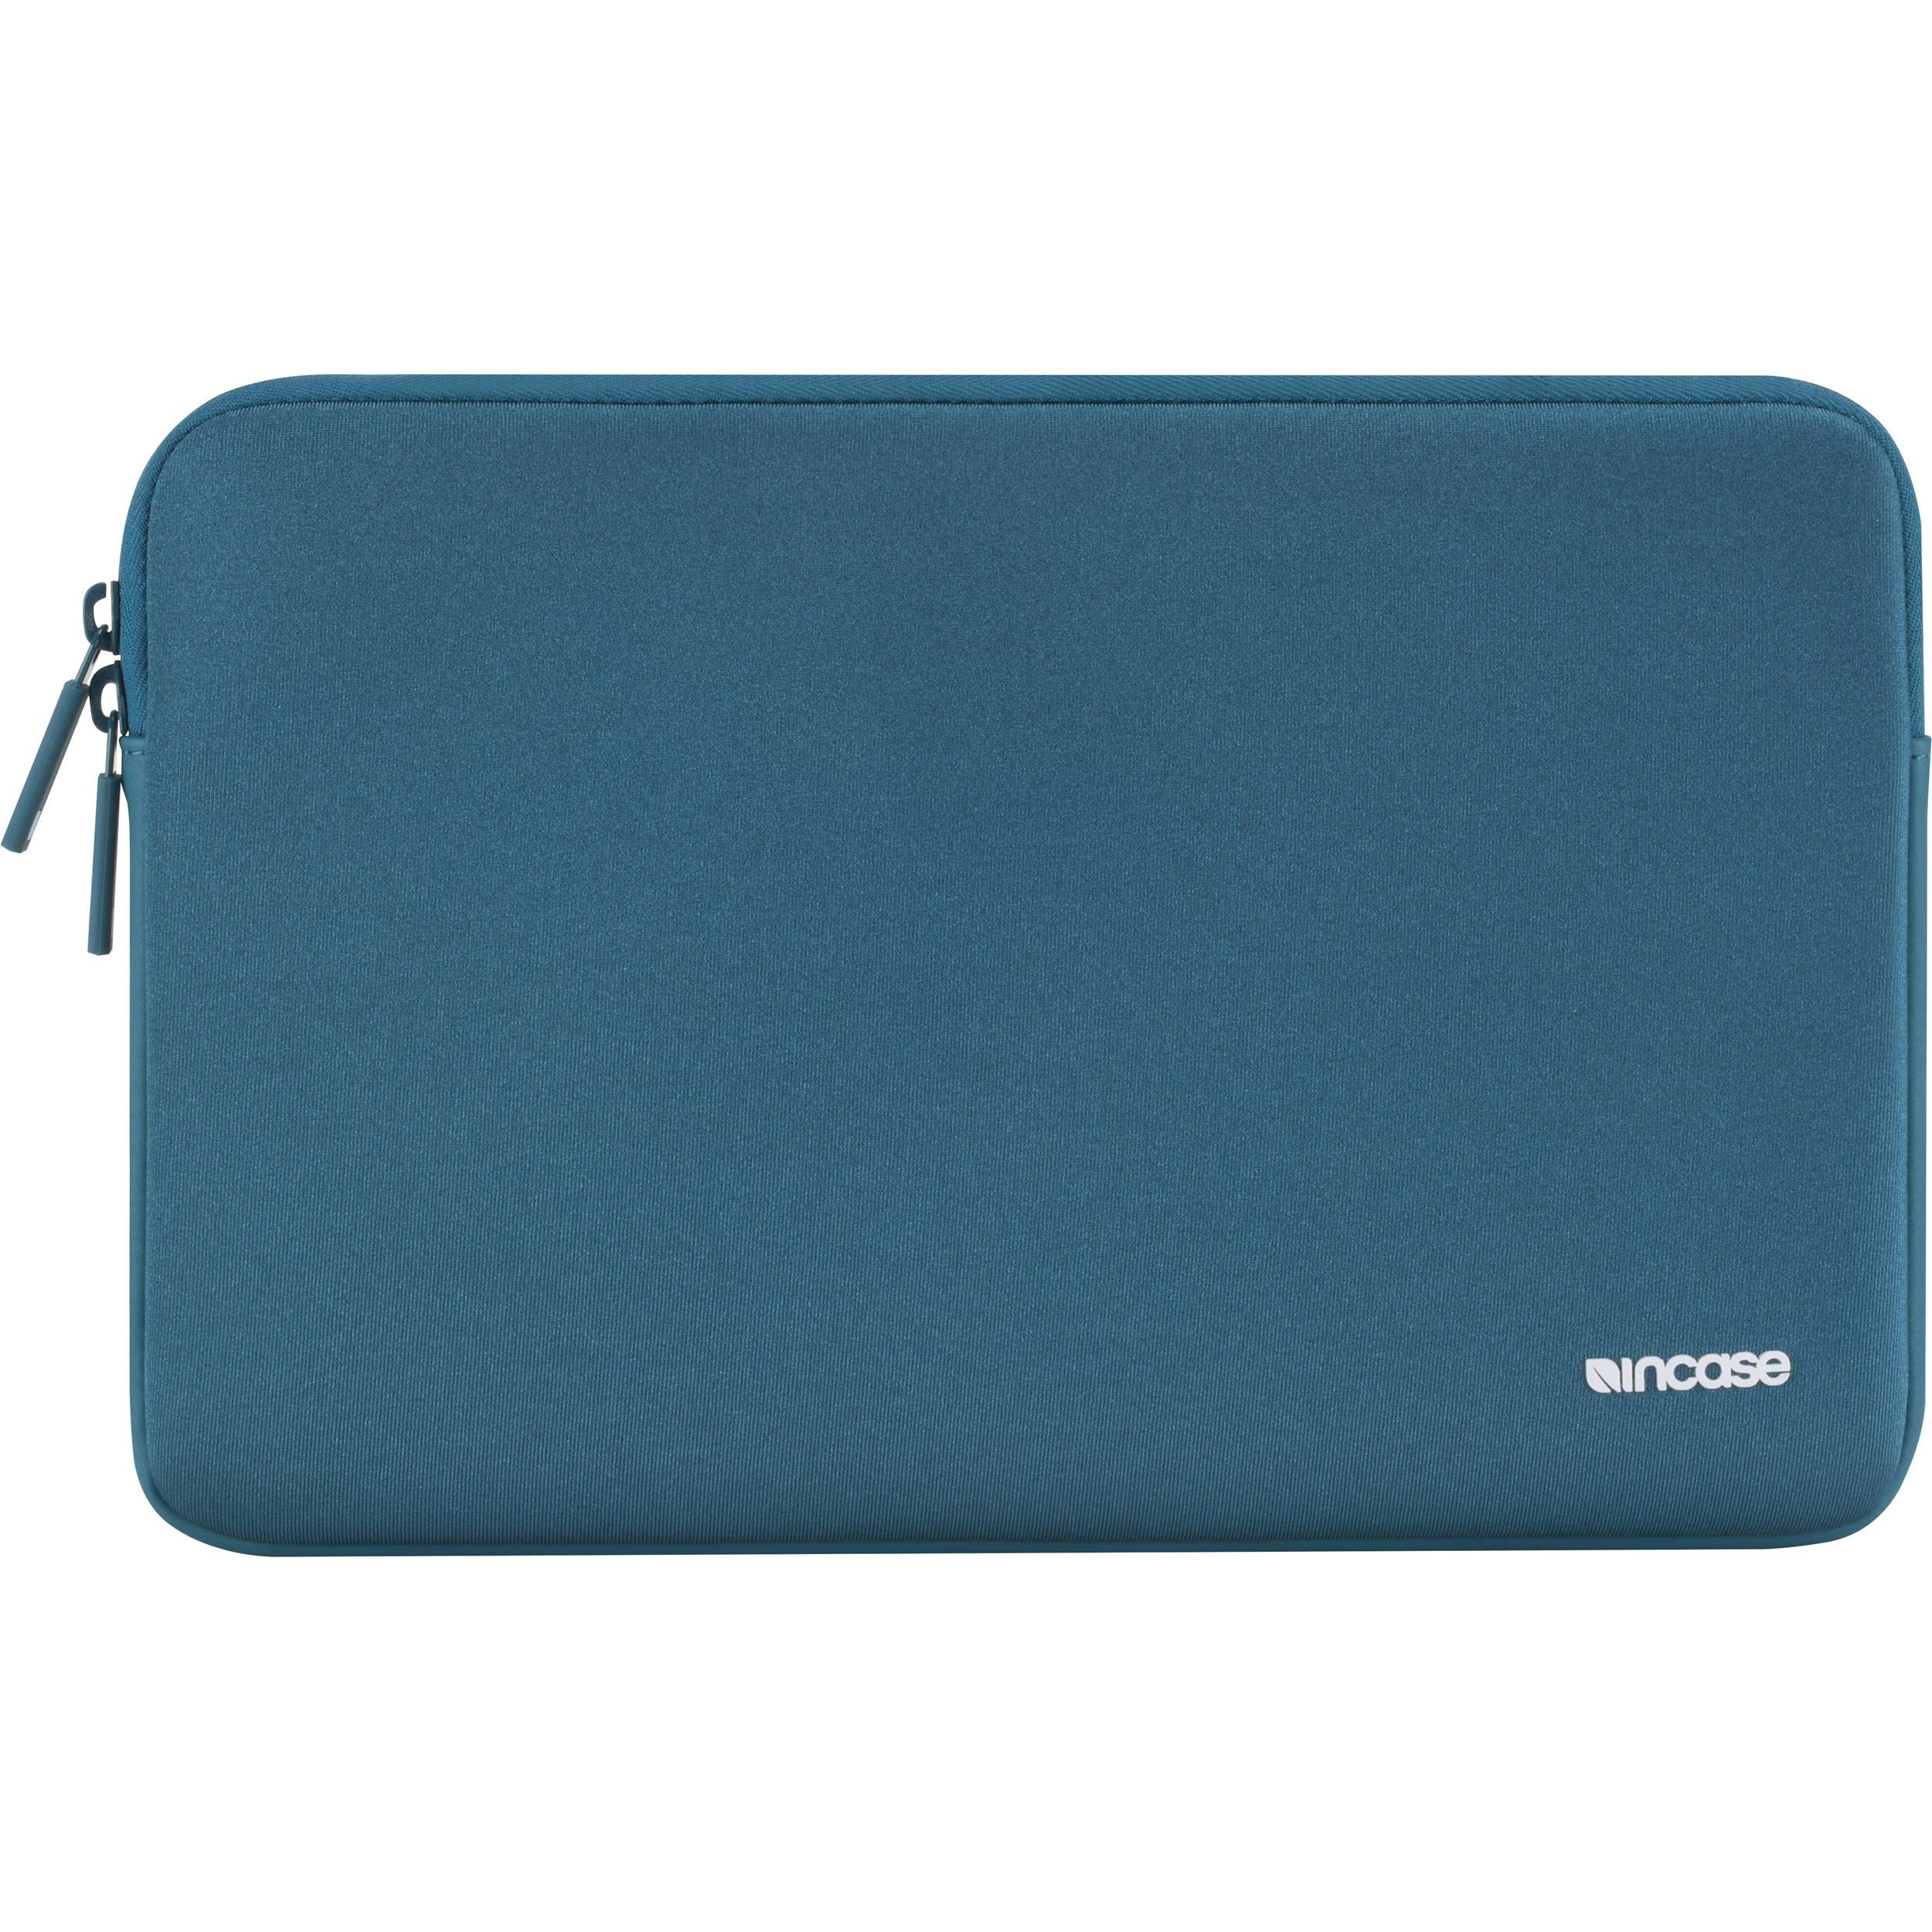 sale retailer d9e87 cd129 Incase Designs Corp Classic Sleeve for 13